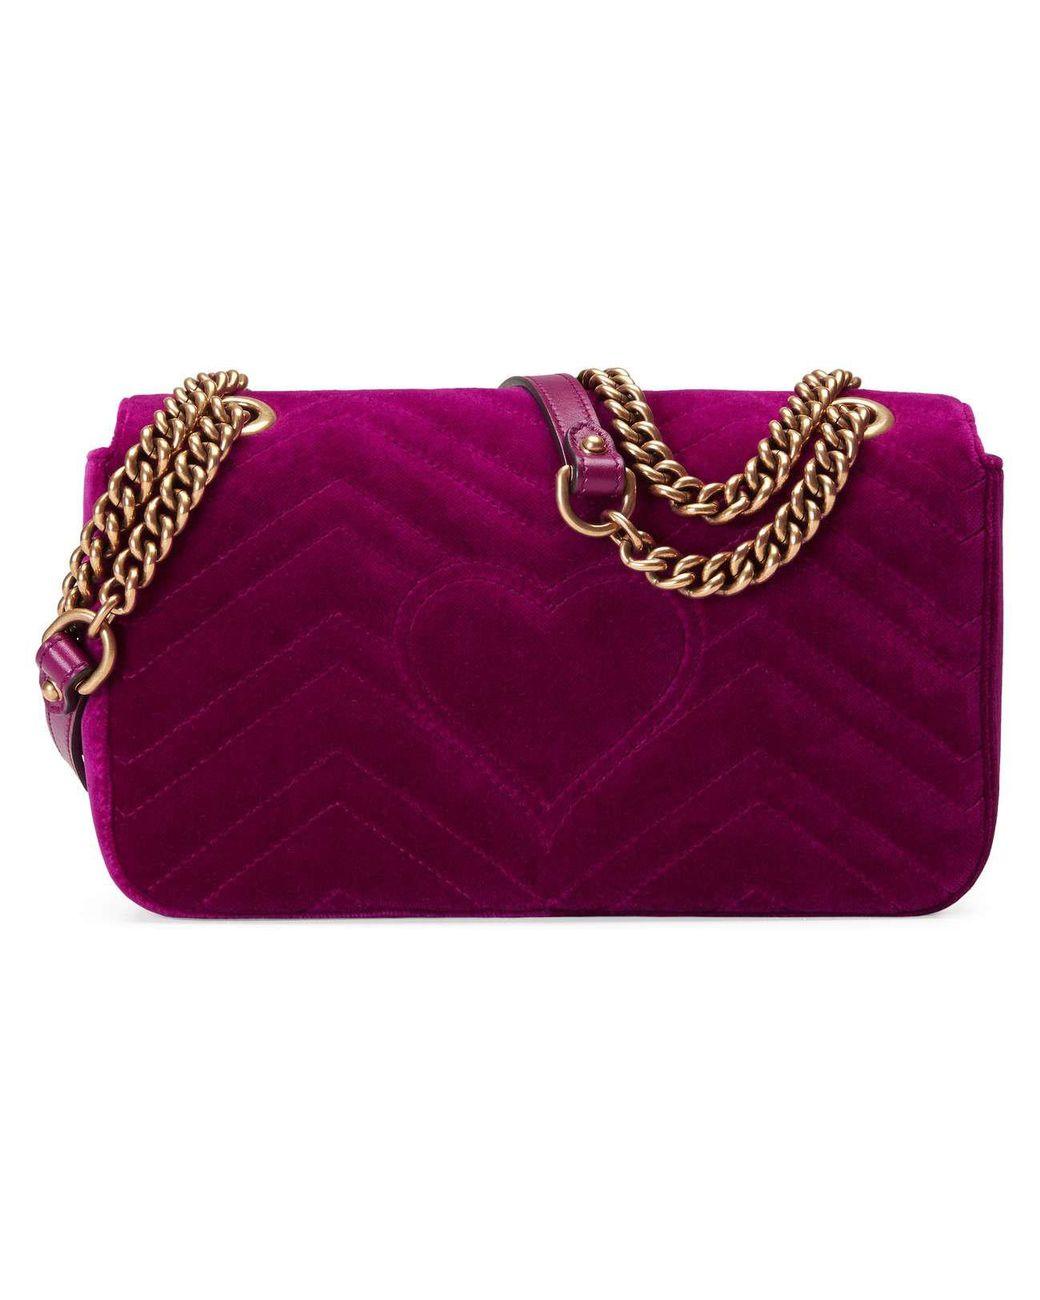 962d58f1daab Gucci GG Marmont Velvet Shoulder Bag in Purple - Save 30% - Lyst